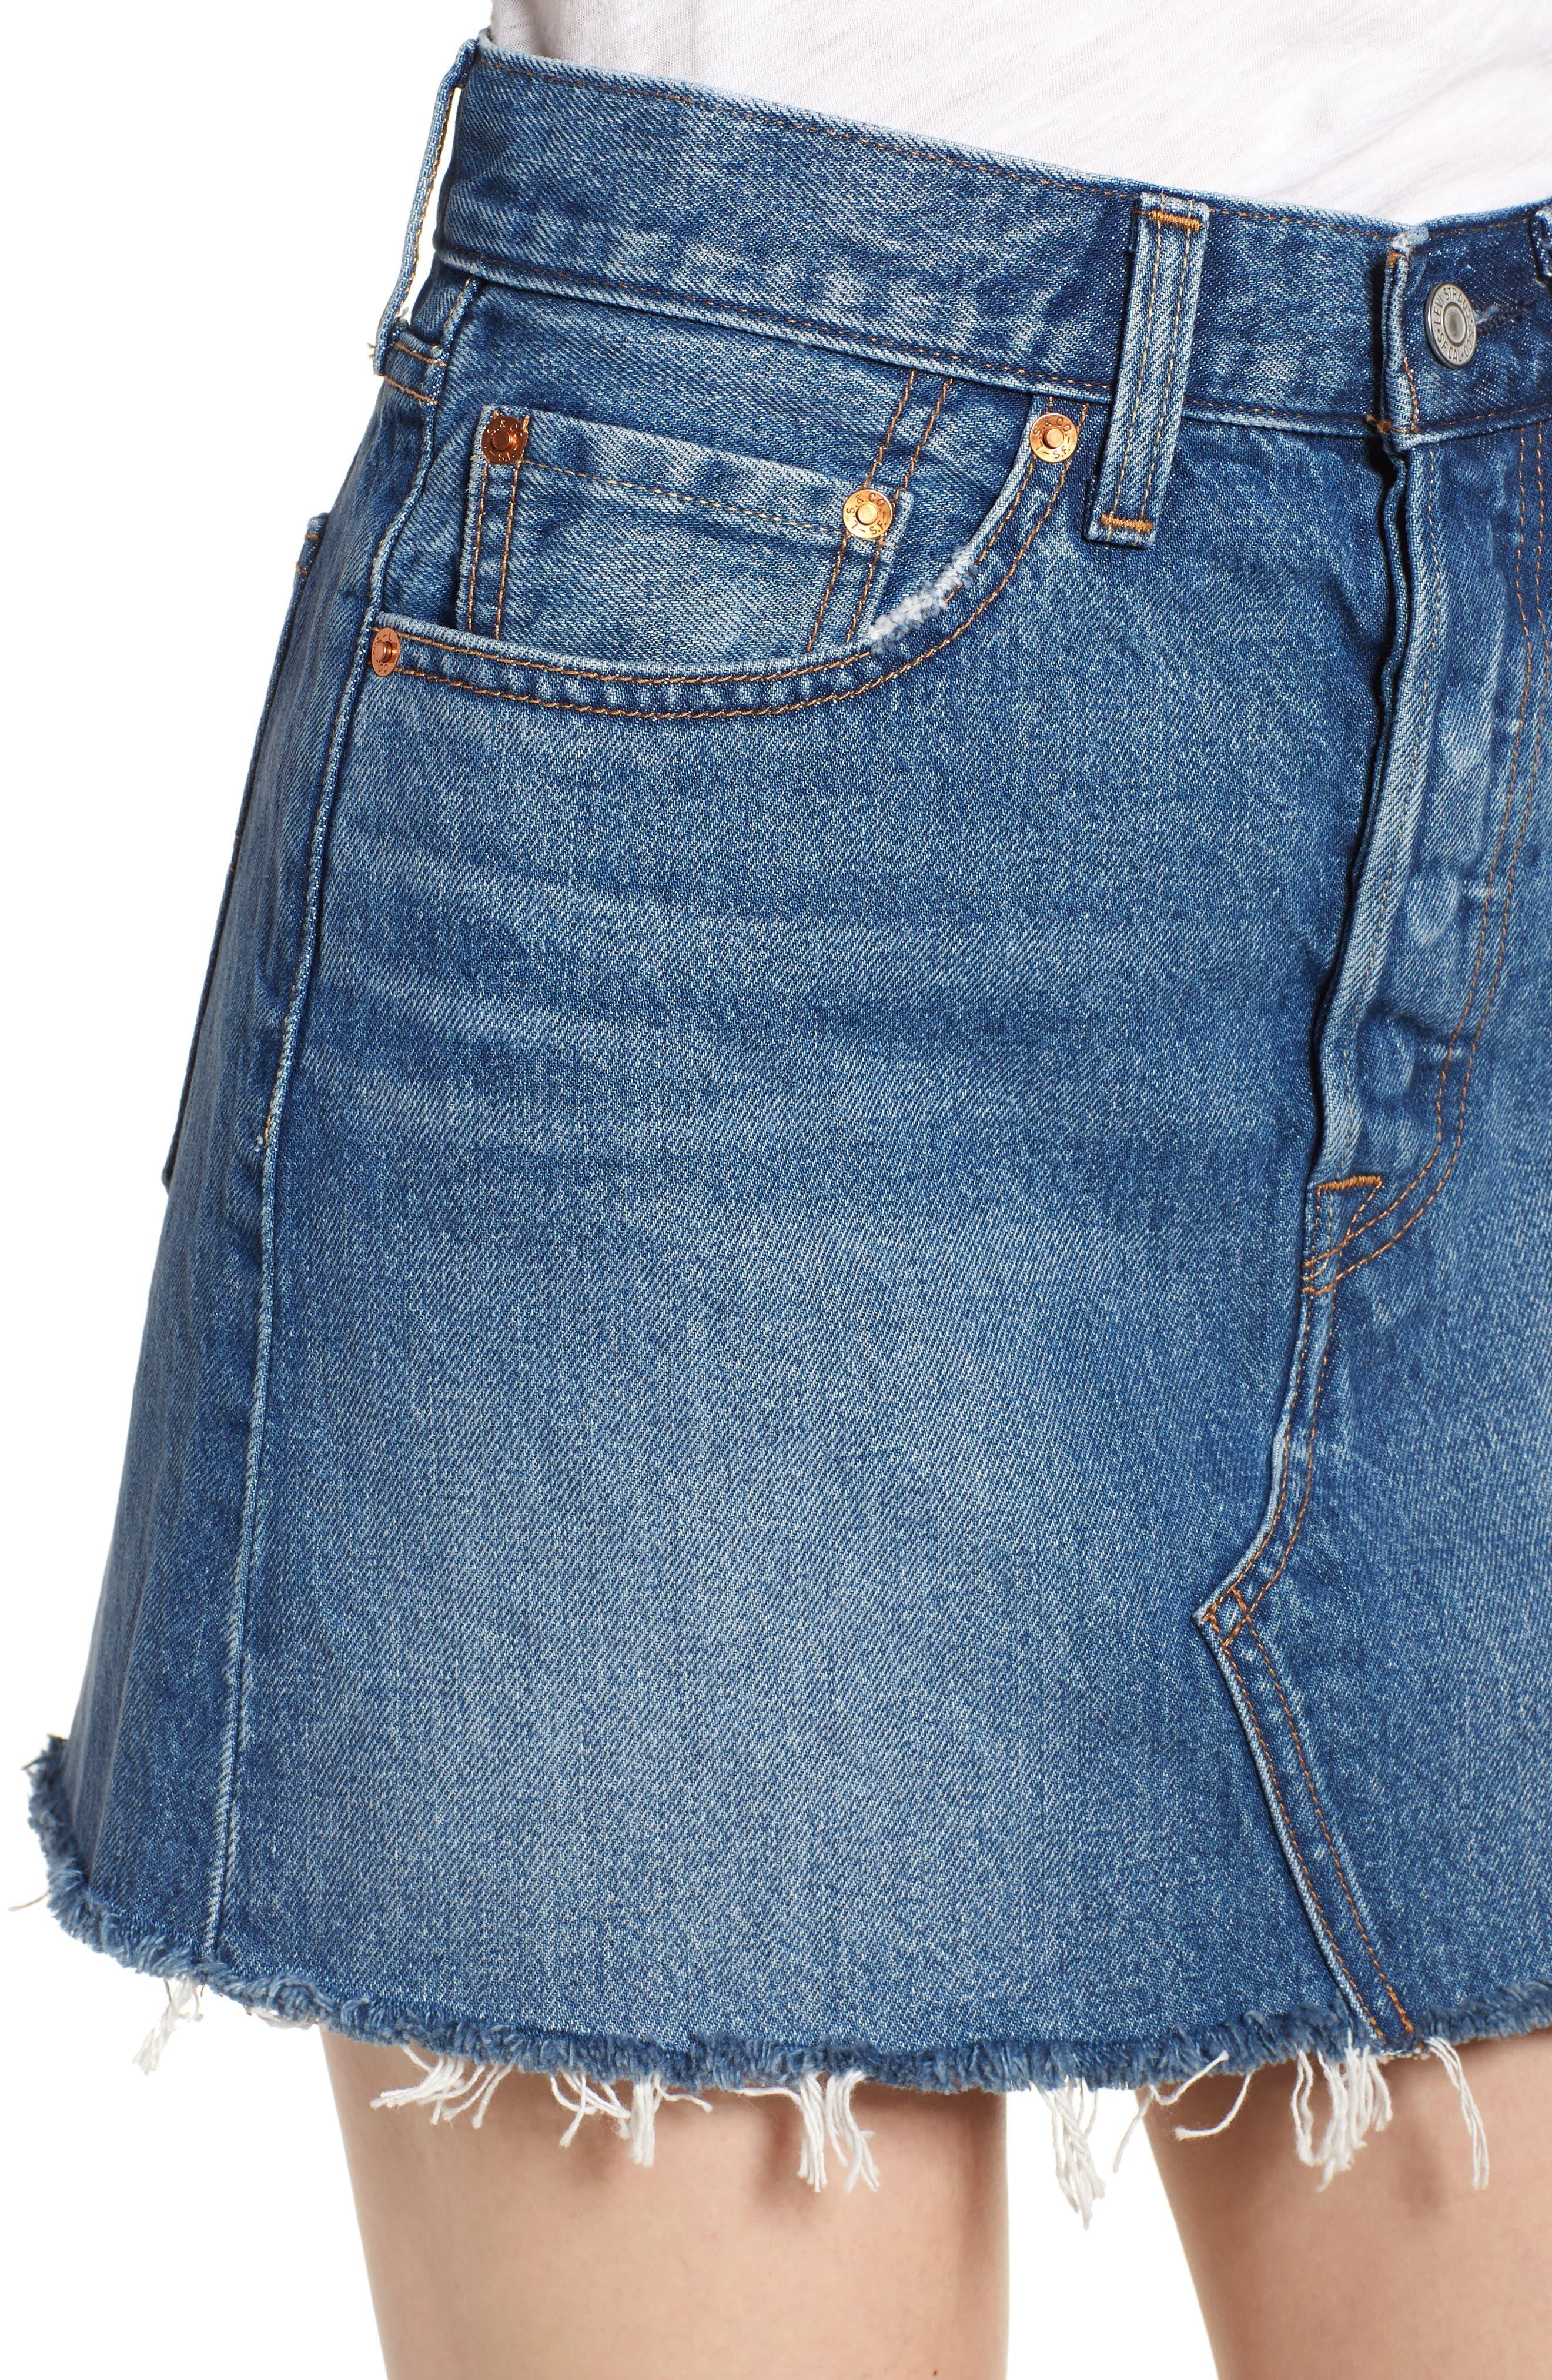 LEVI'S<SUP>®</SUP>, Deconstructed Denim Skirt, Alternate thumbnail 5, color, MIDDLE MAN